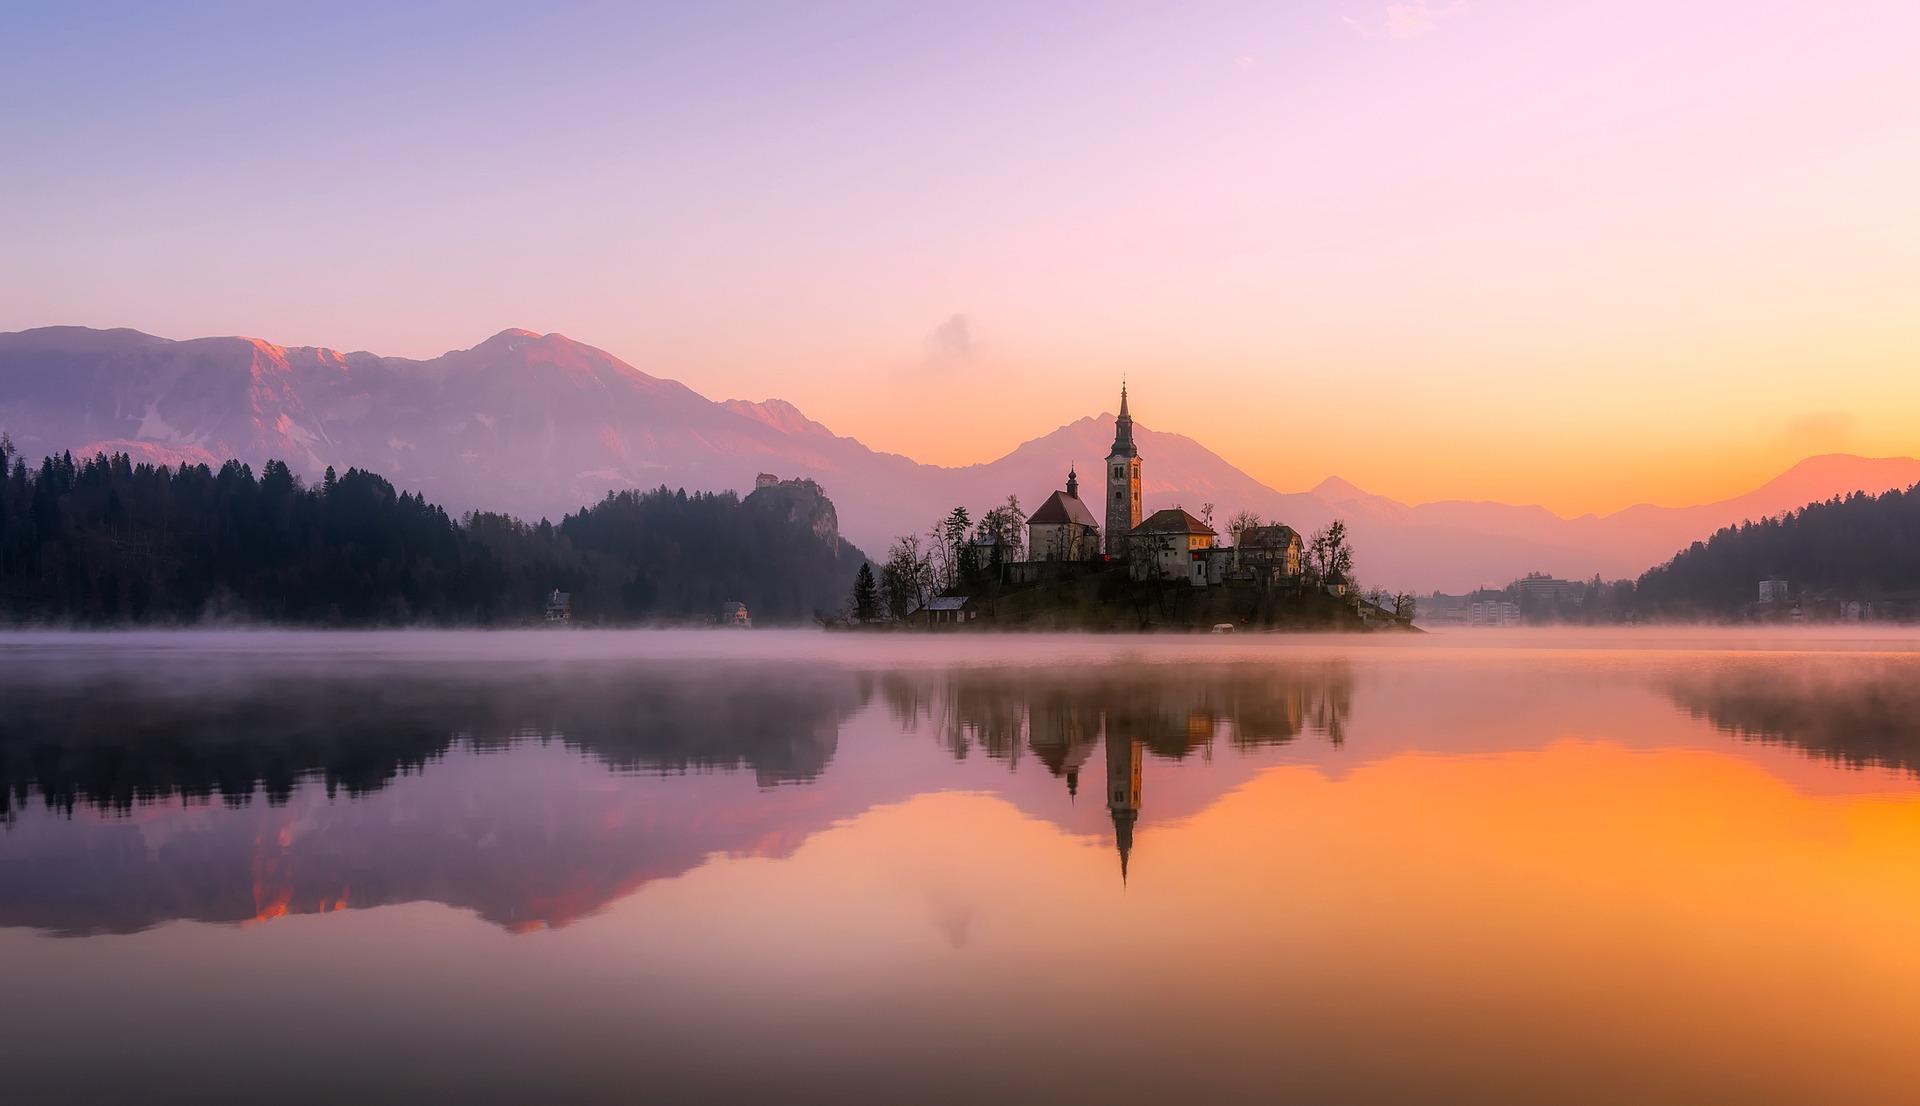 Advent austrijsko slovenska bajka